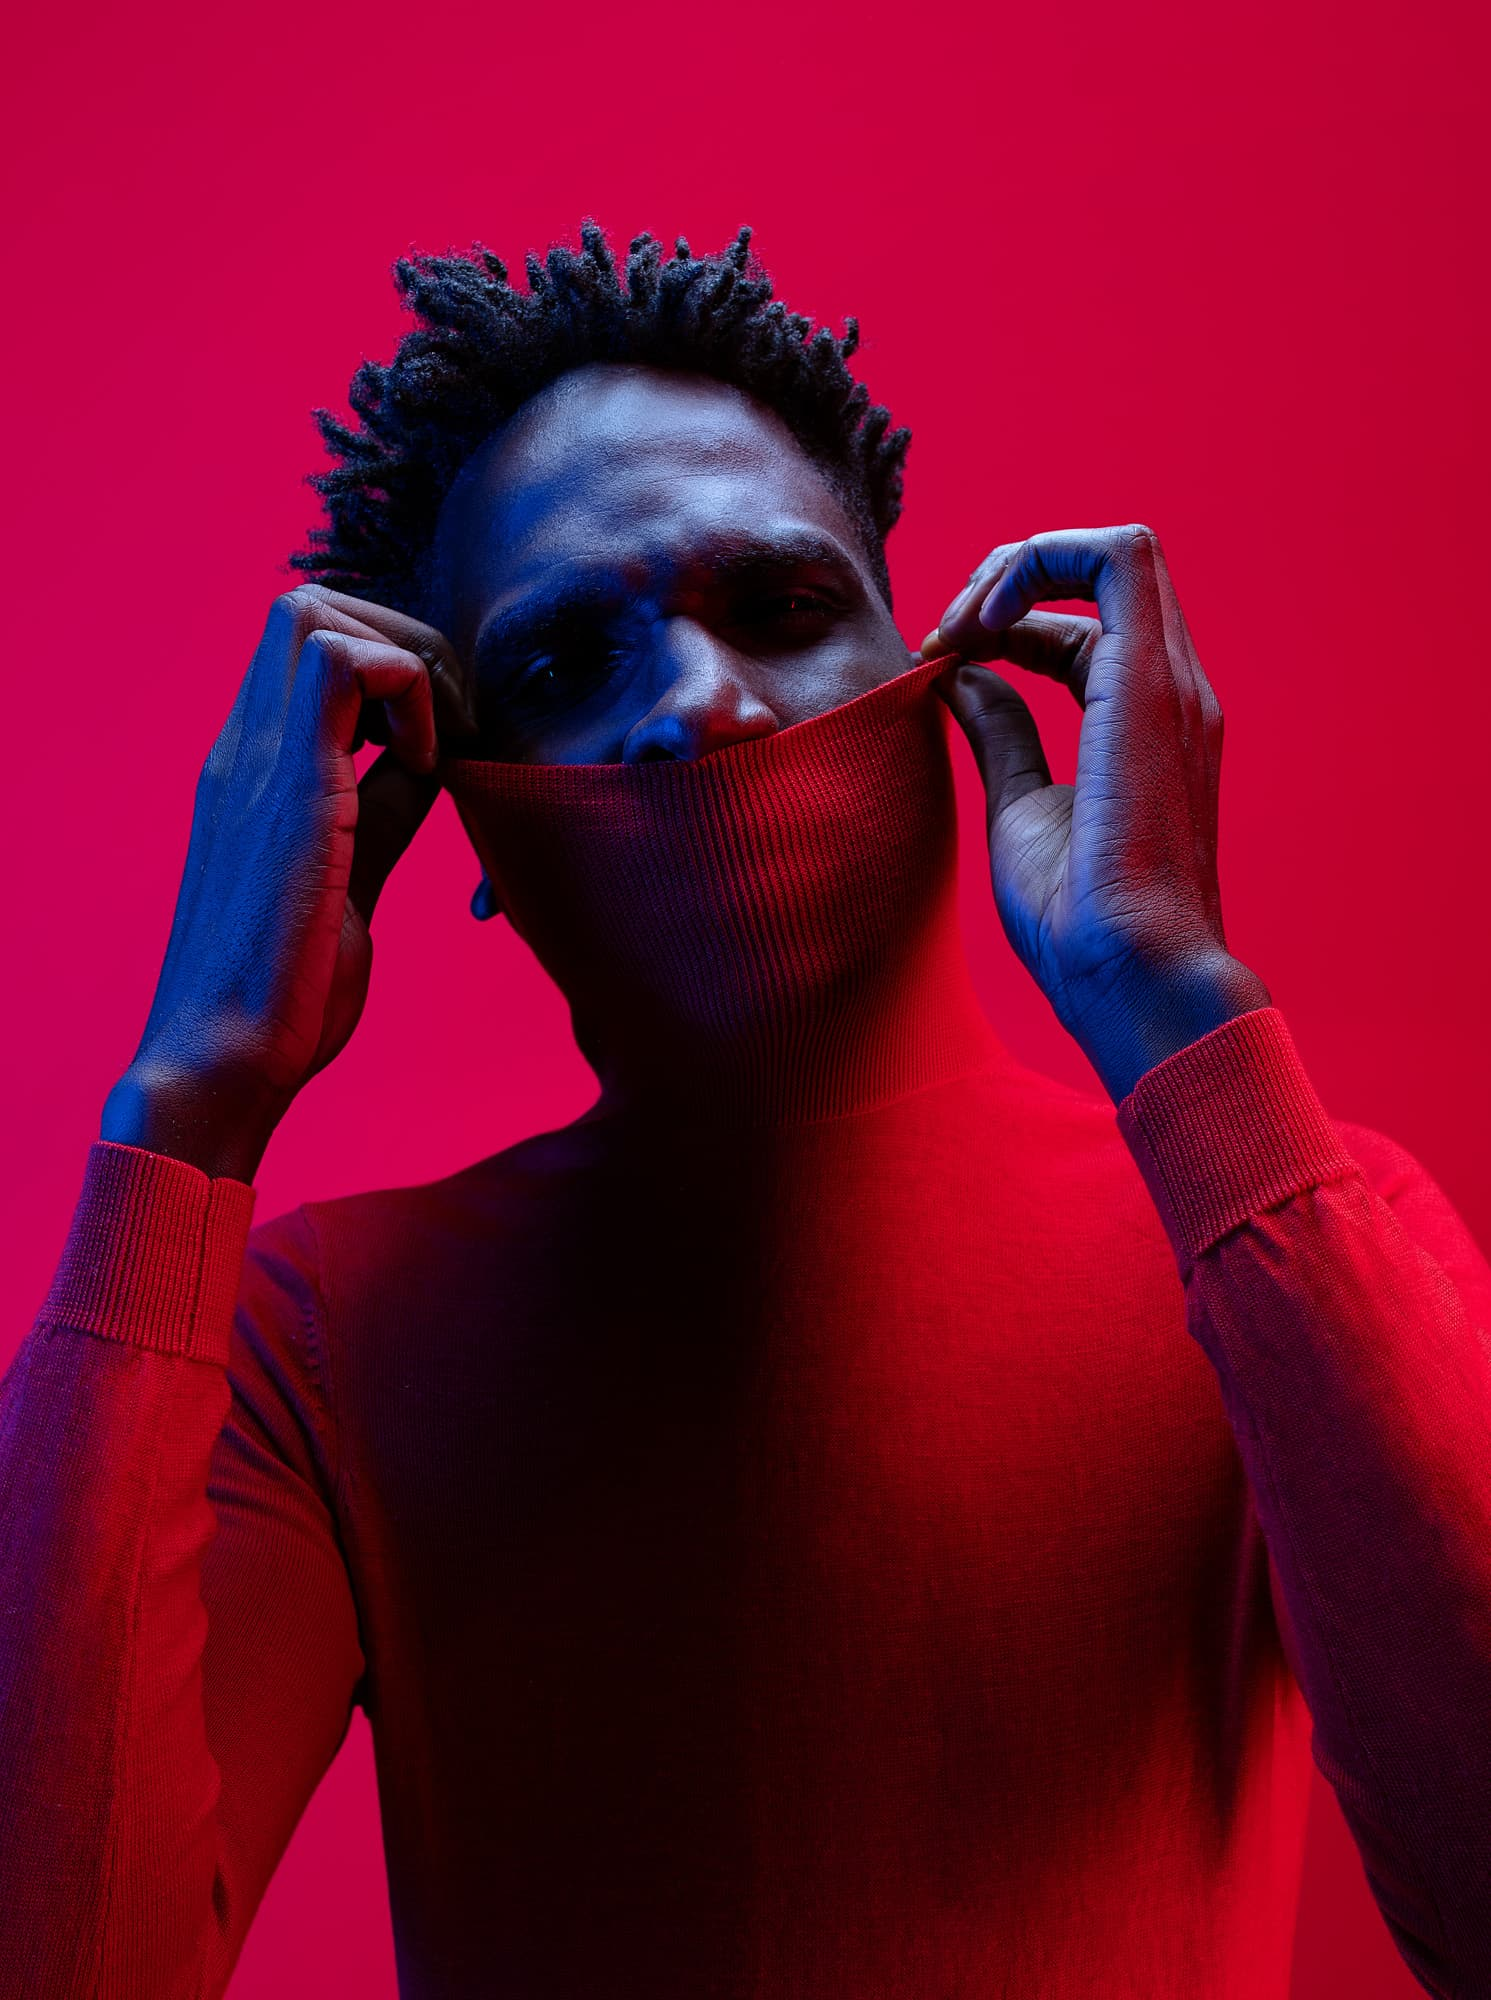 webseite-HolgerAltgeld-Pascal-Nkongo-portraits-023